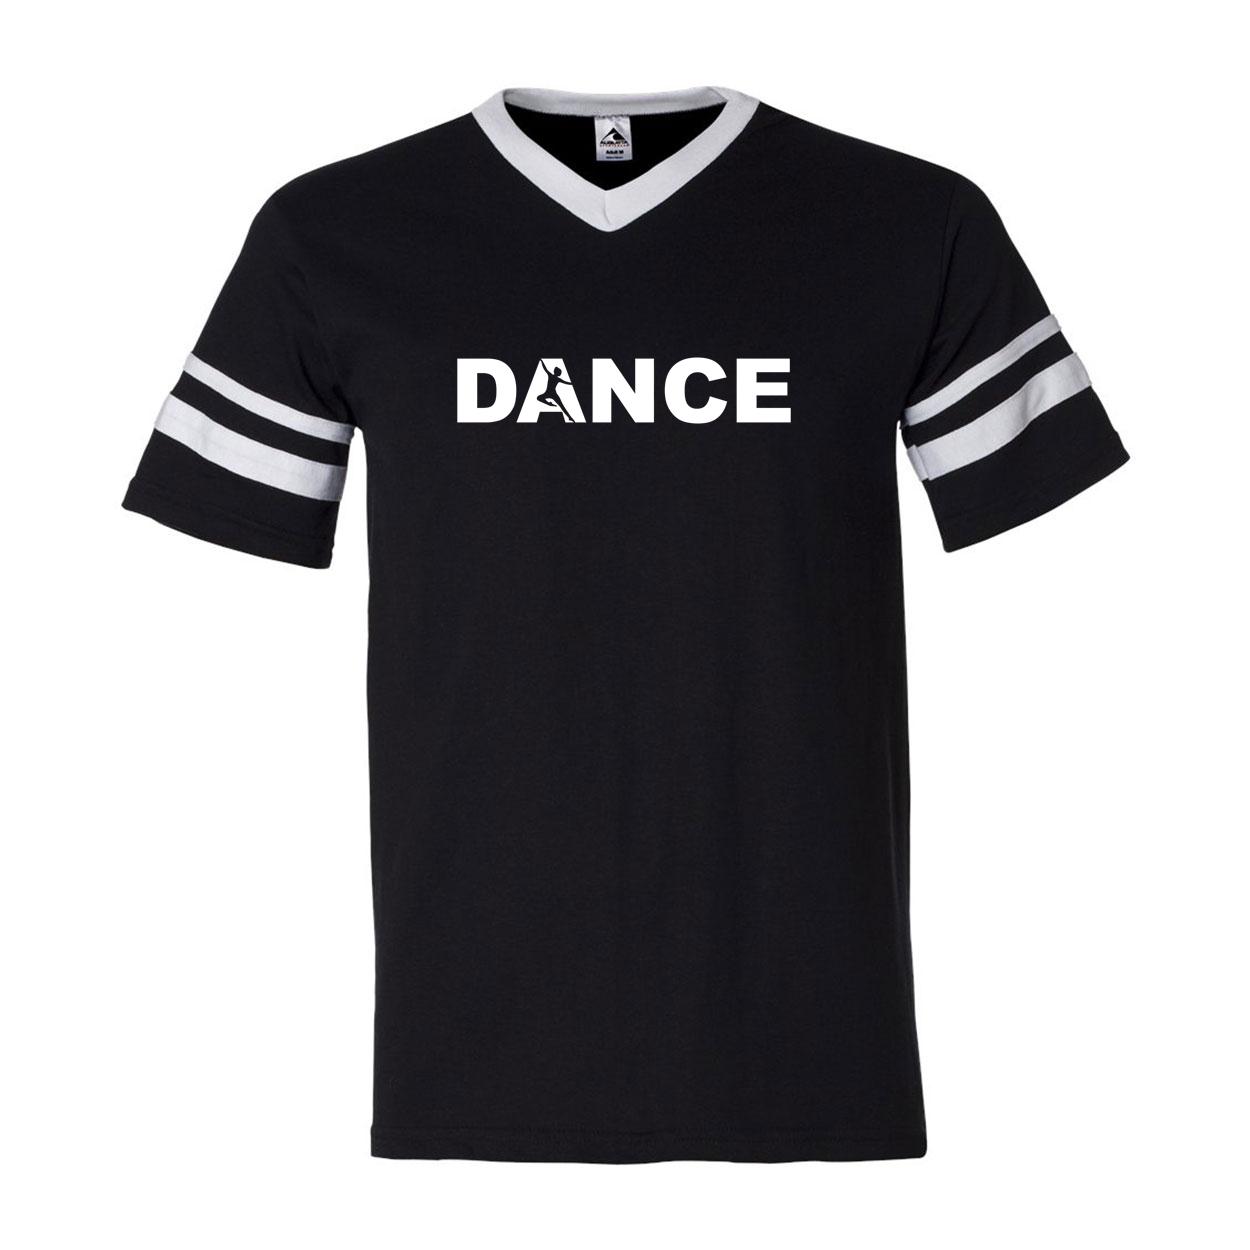 Dance Silhouette Logo Classic Premium Striped Jersey T-Shirt Black/White (White Logo)